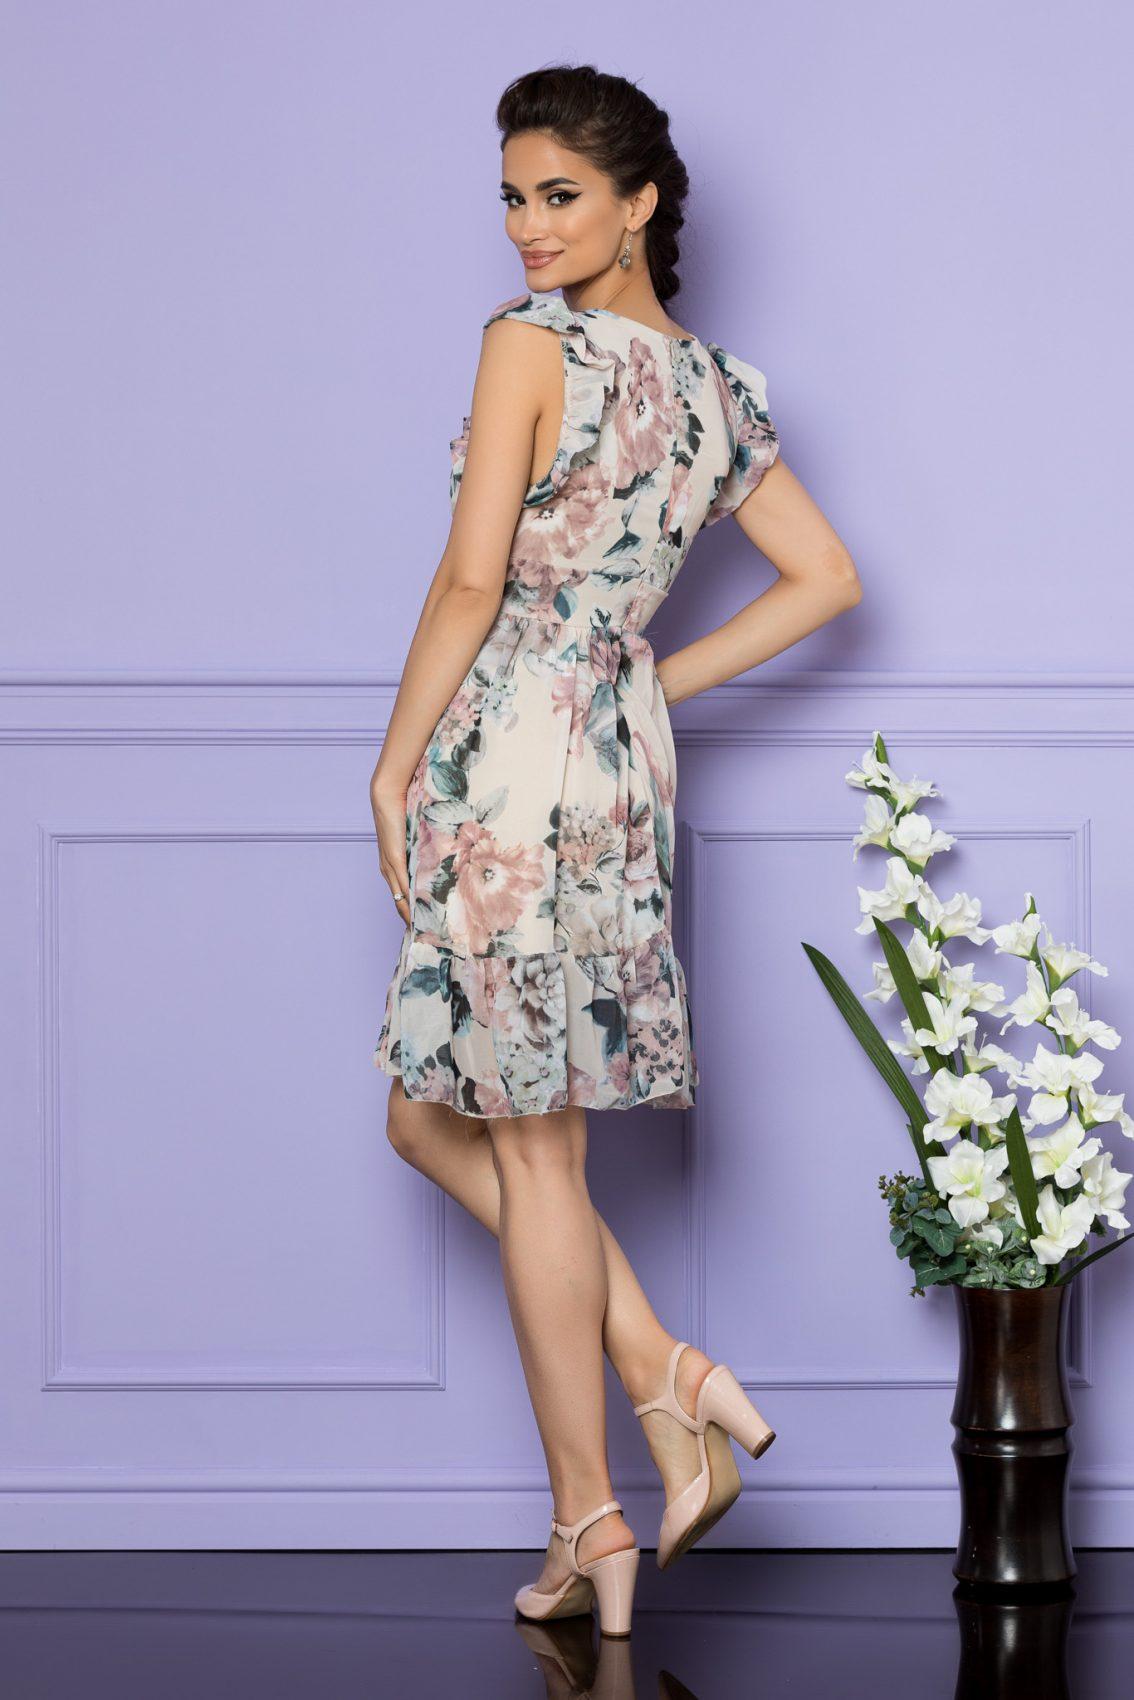 Nude Αμάνικο Φόρεμα Με Βολάν Elody A759 2